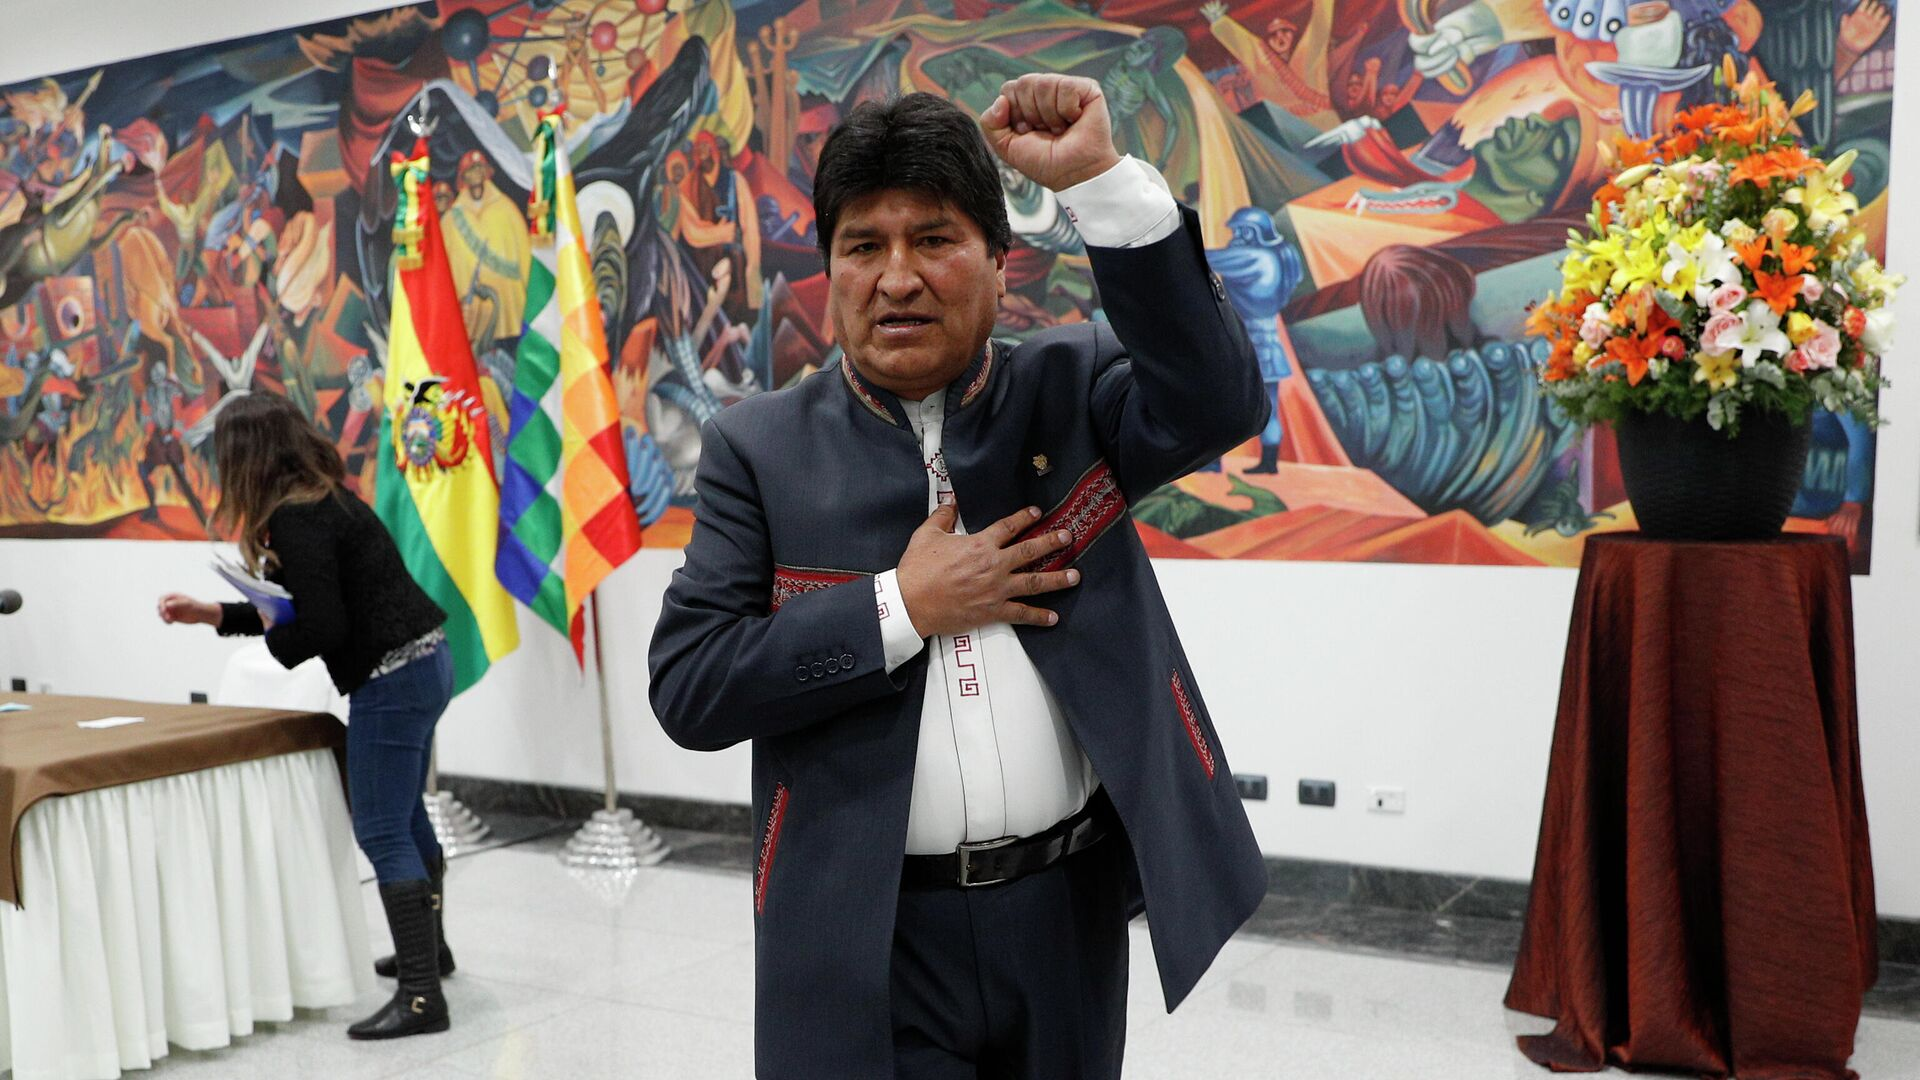 Президент Боливии Эво Моралес после пресс-конференции в Ла-Пас, Боливия. 24 октября 2019 - РИА Новости, 1920, 13.01.2020